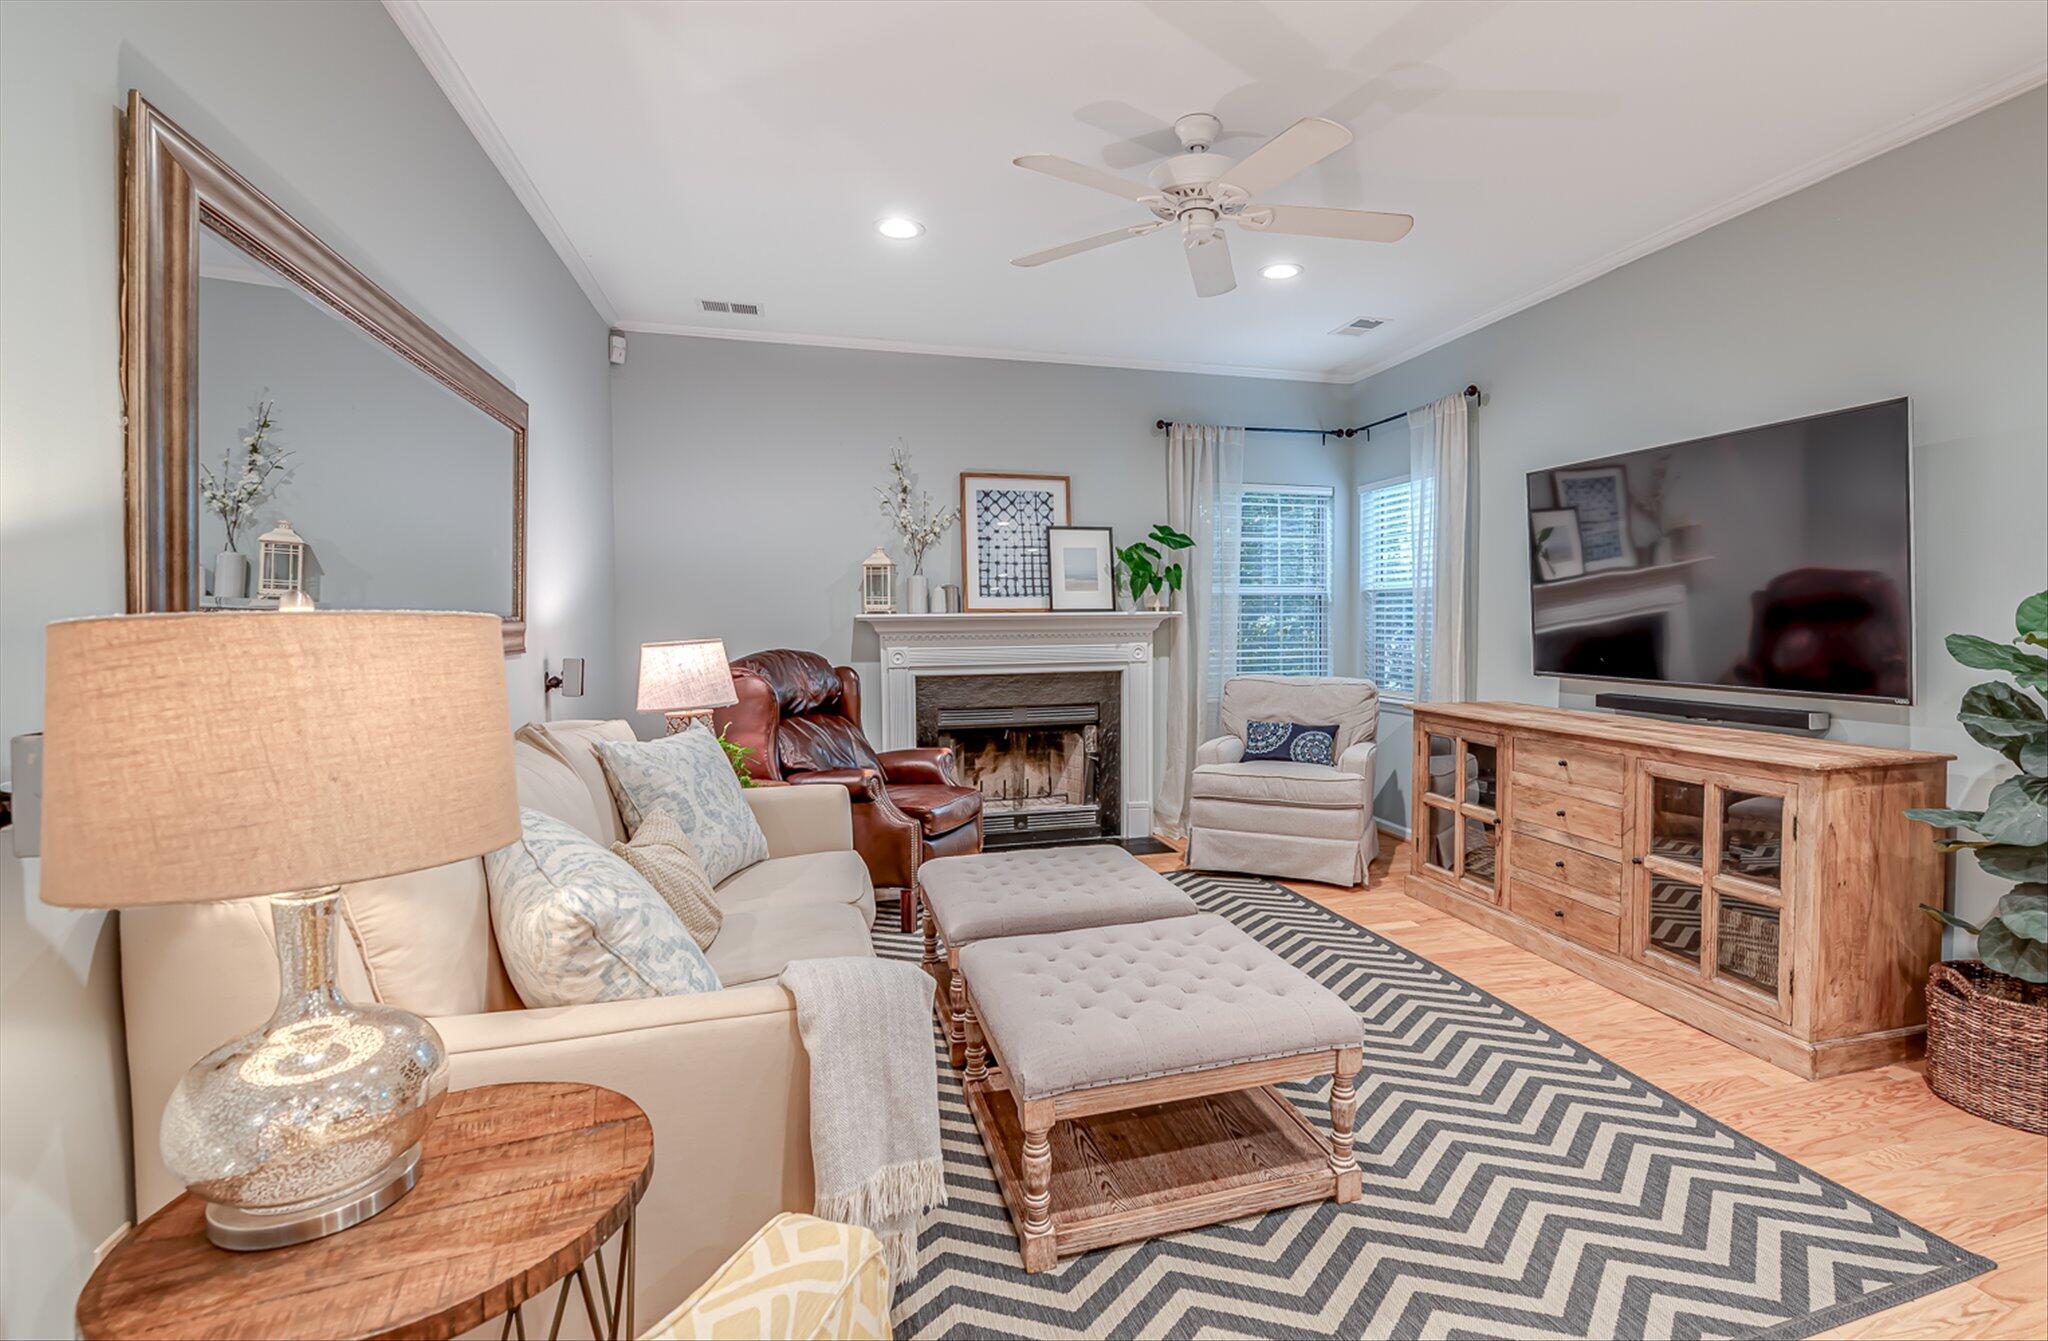 Belle Hall Homes For Sale - 278 Jardinere, Mount Pleasant, SC - 9